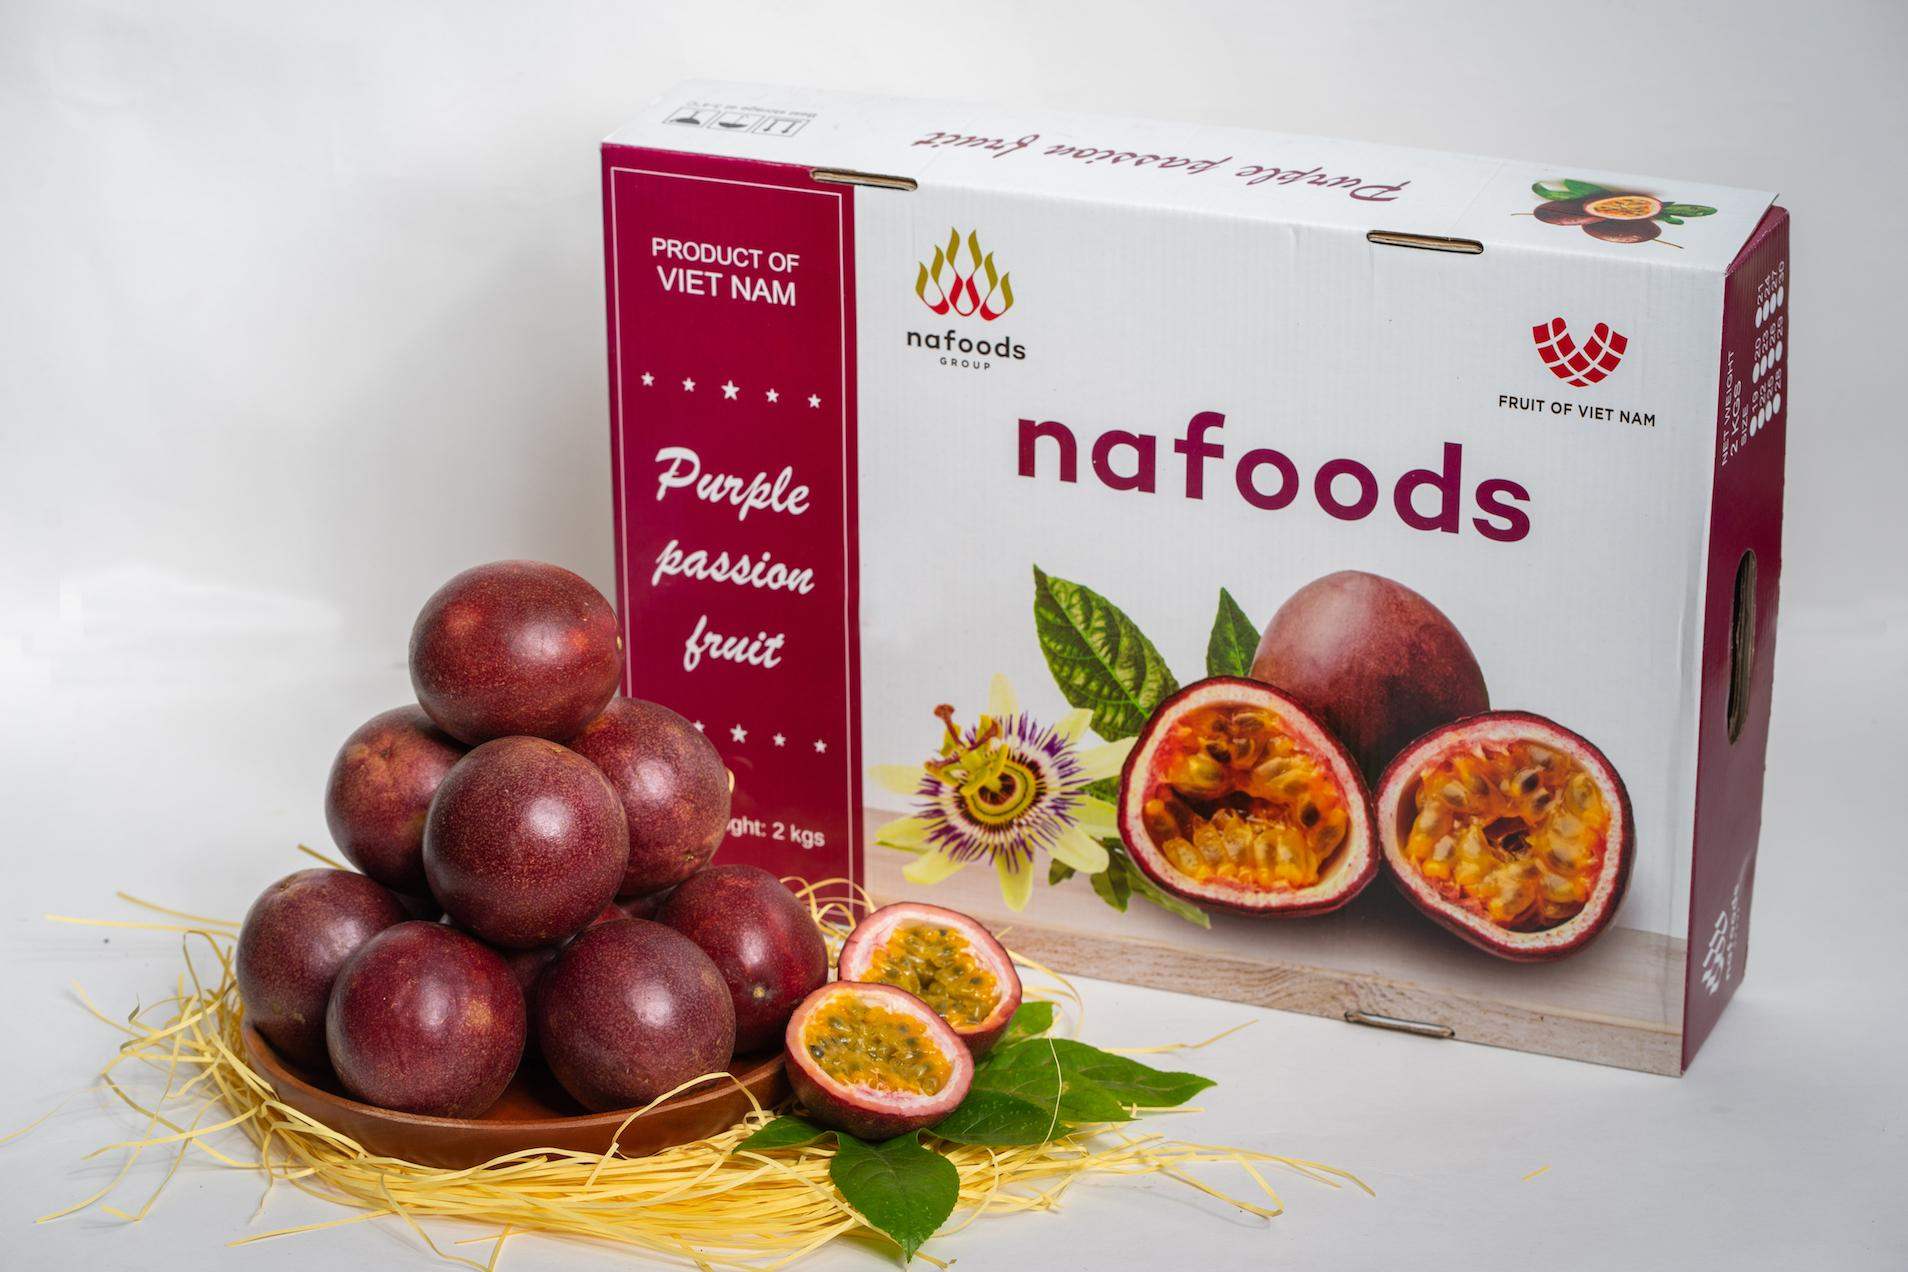 Nafoods báo lãi quý III tăng 79%